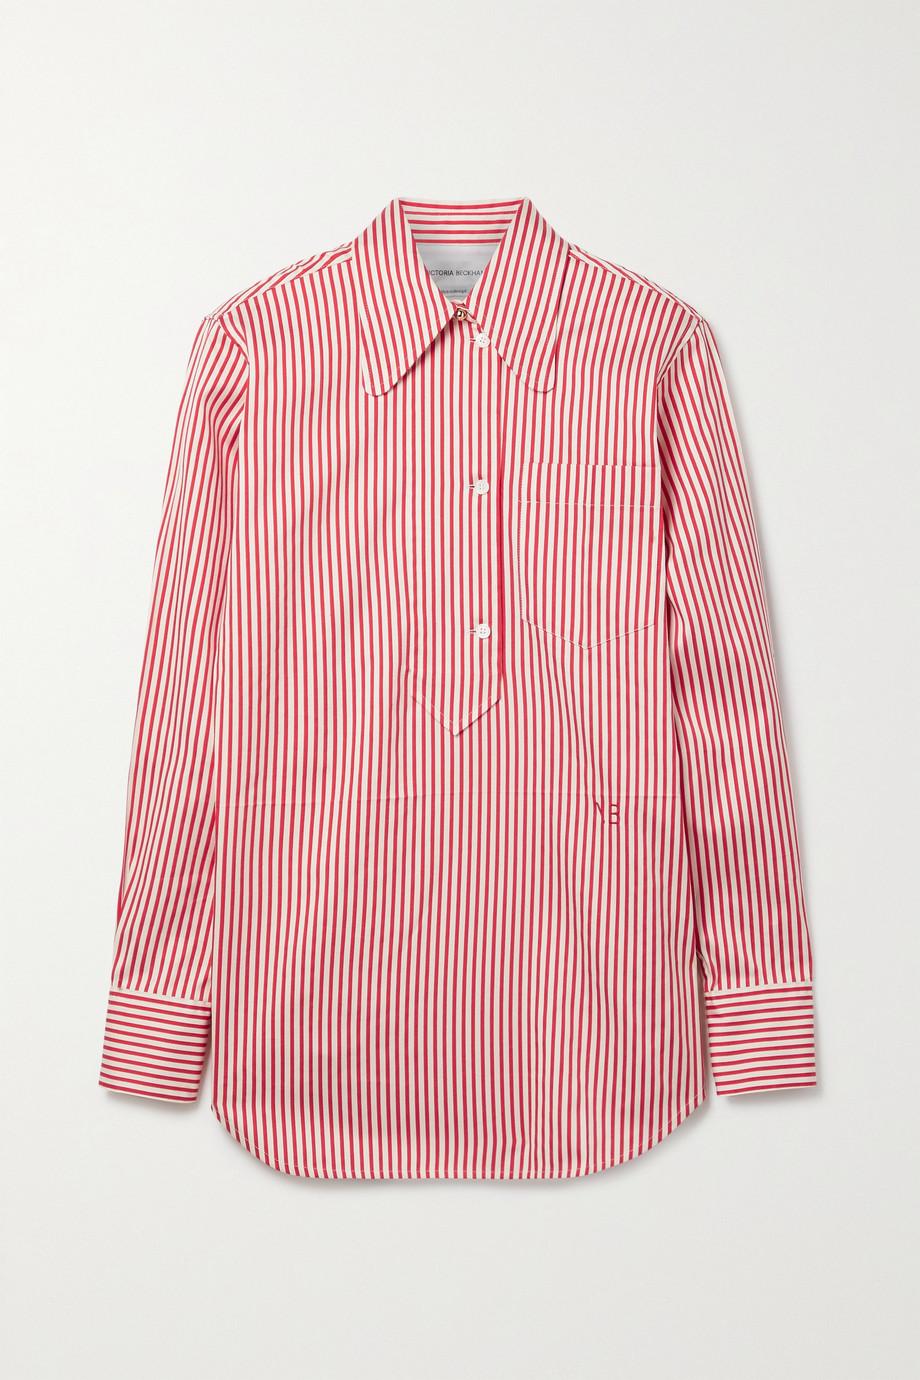 Victoria Beckham 条纹棉丝混纺牛津纺衬衫